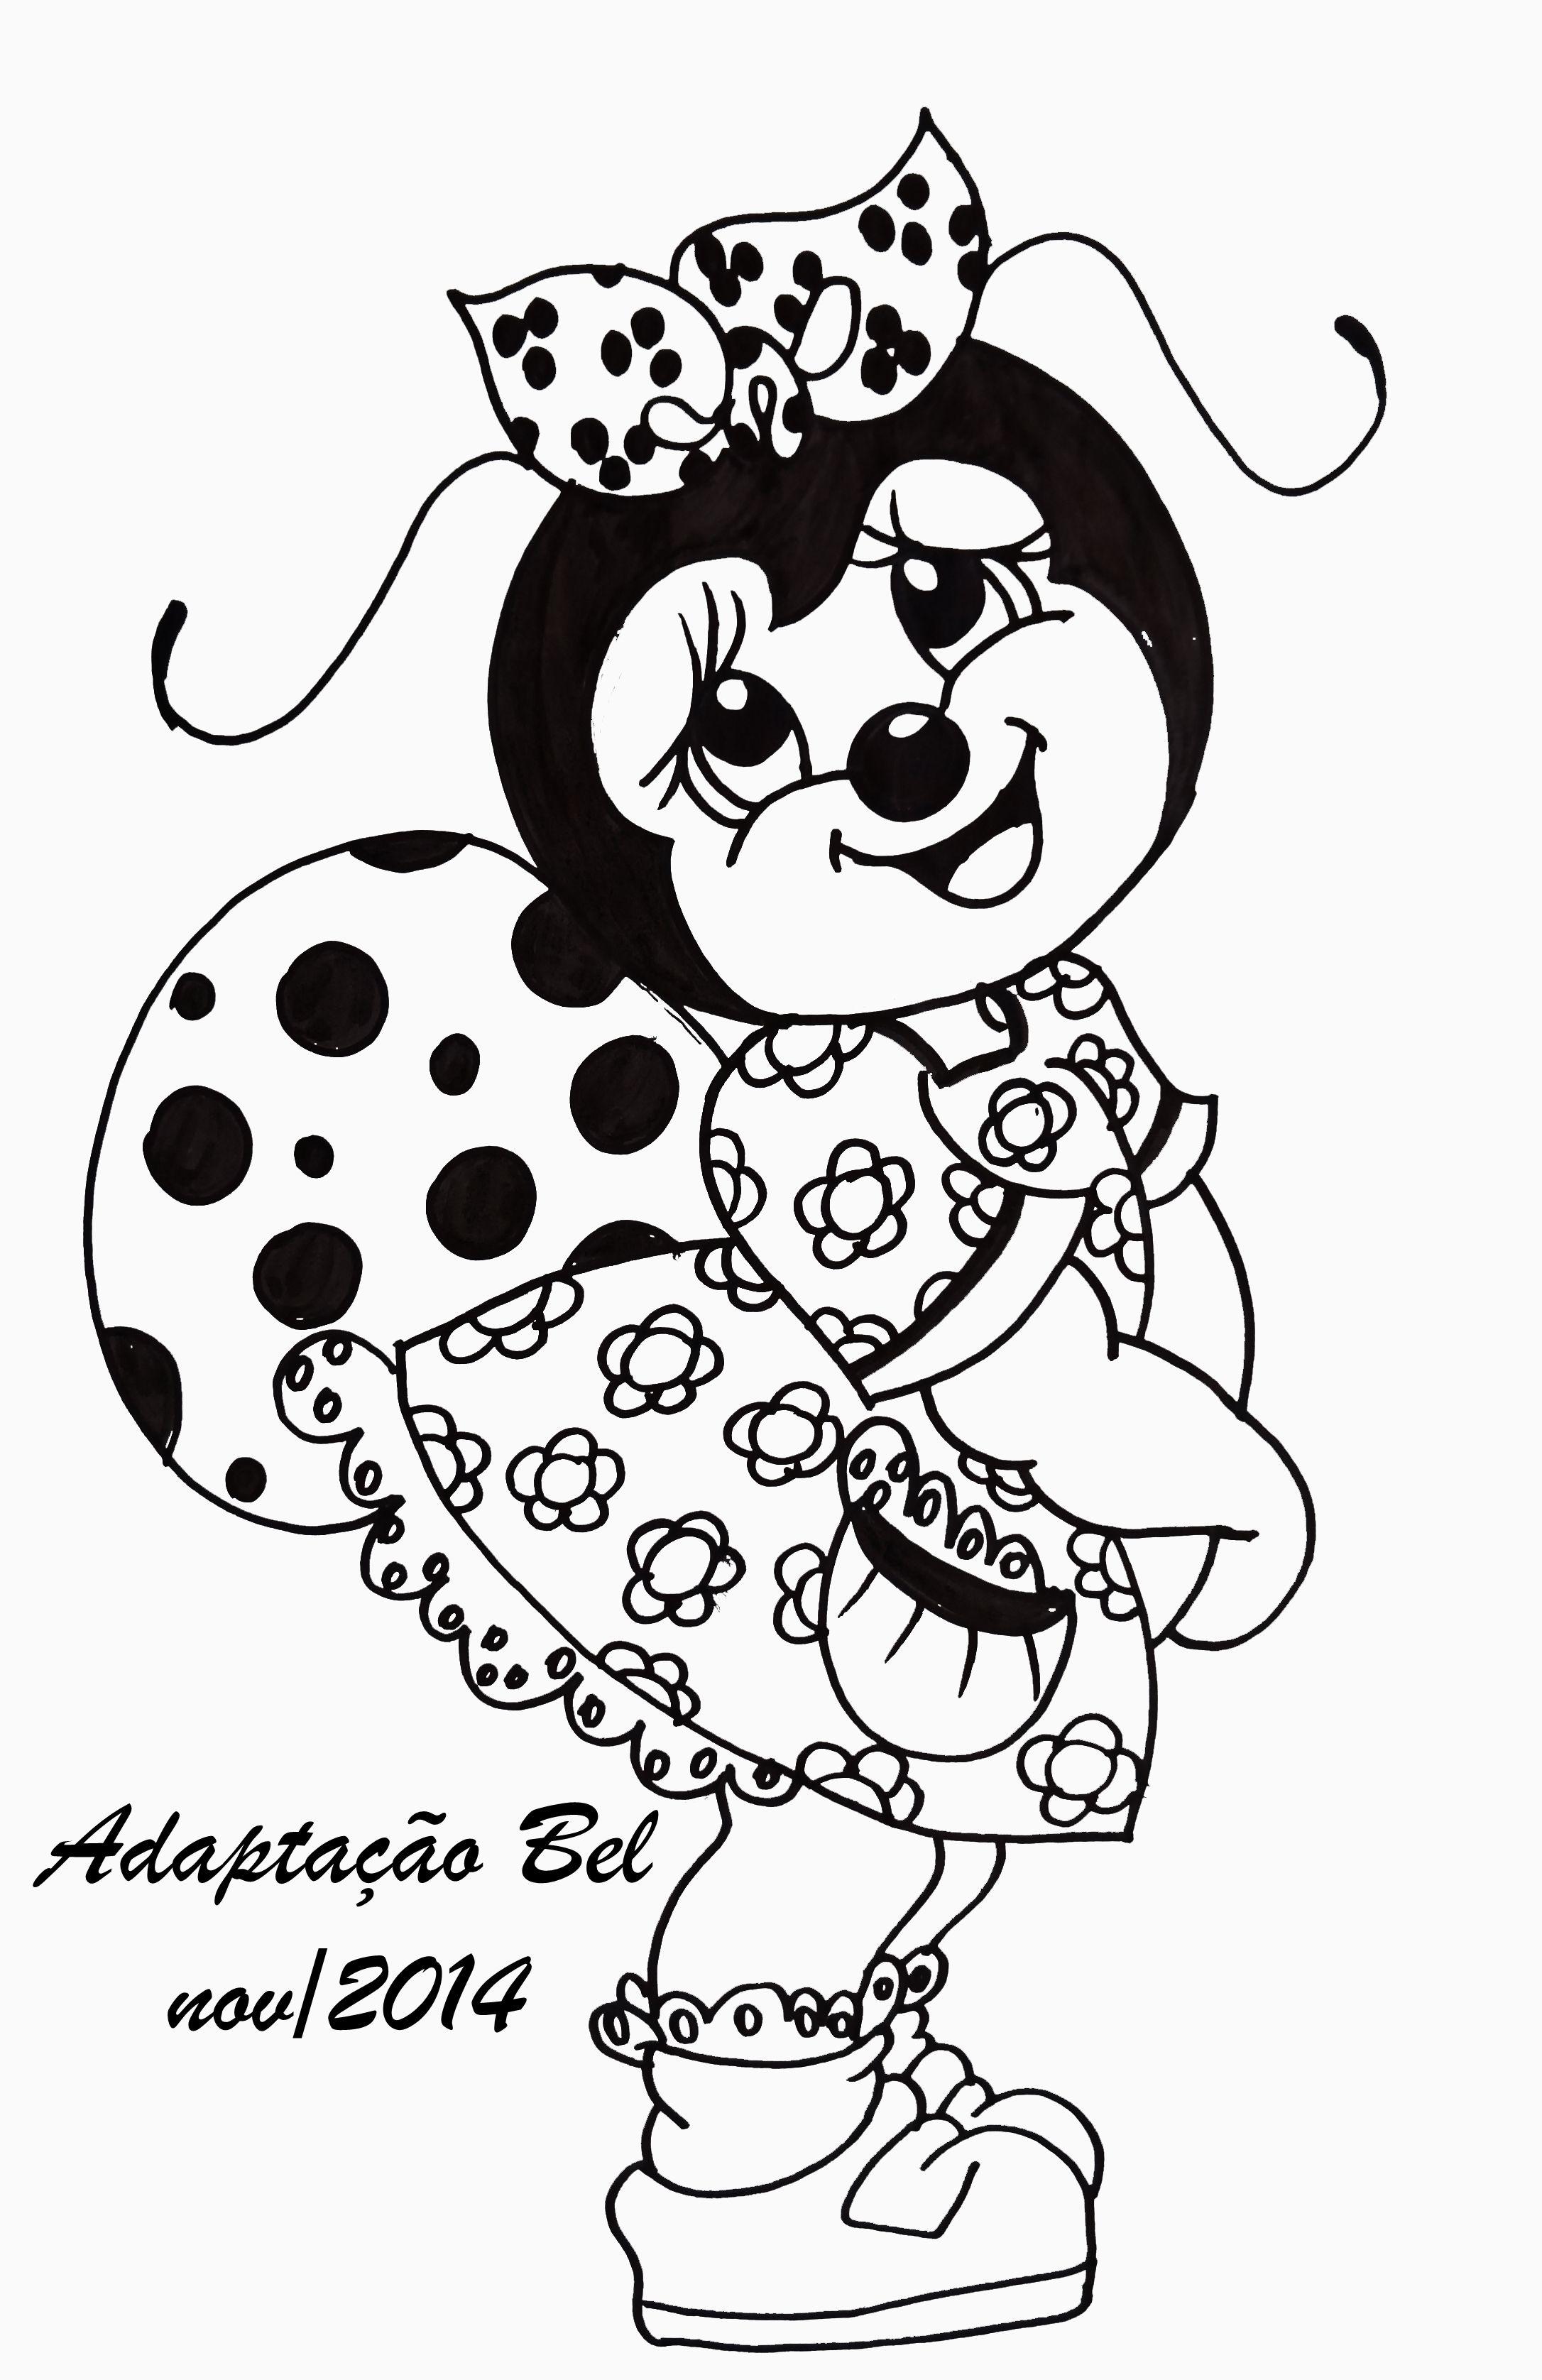 Pin De Minta Geyer Em Cute Ladybugs Joaninha Desenho Riscos